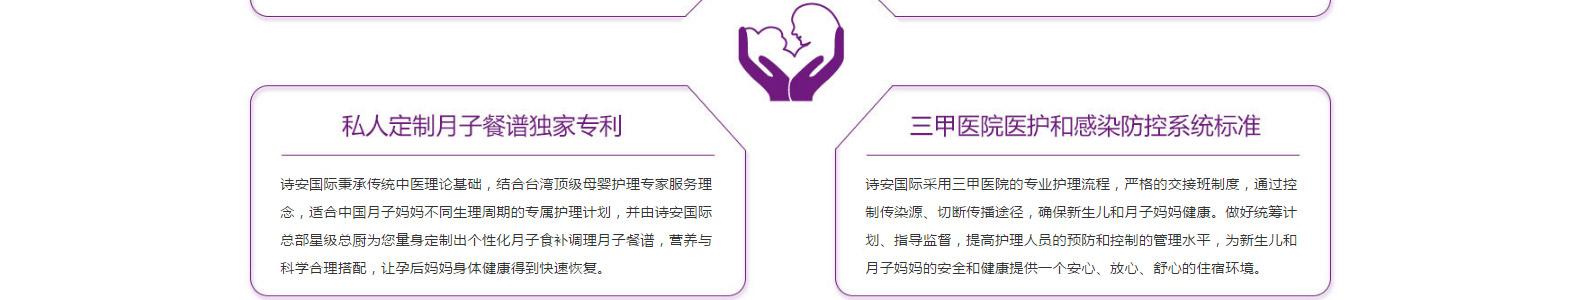 诗安国际母婴会所诗安国际母婴会所_10